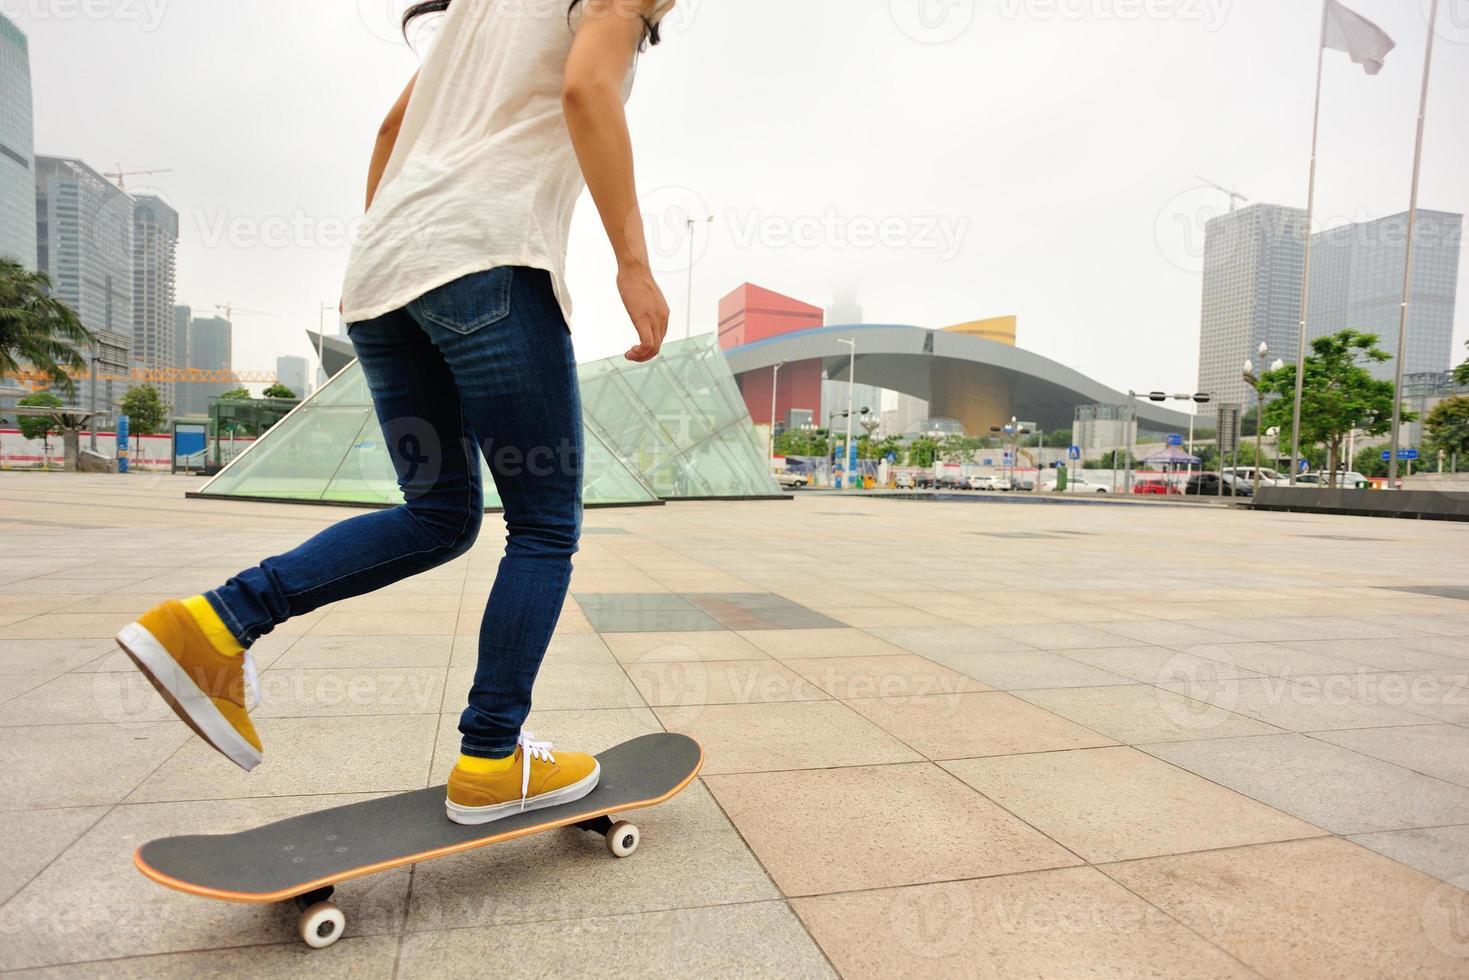 excès de vitesse femme skateboard photo